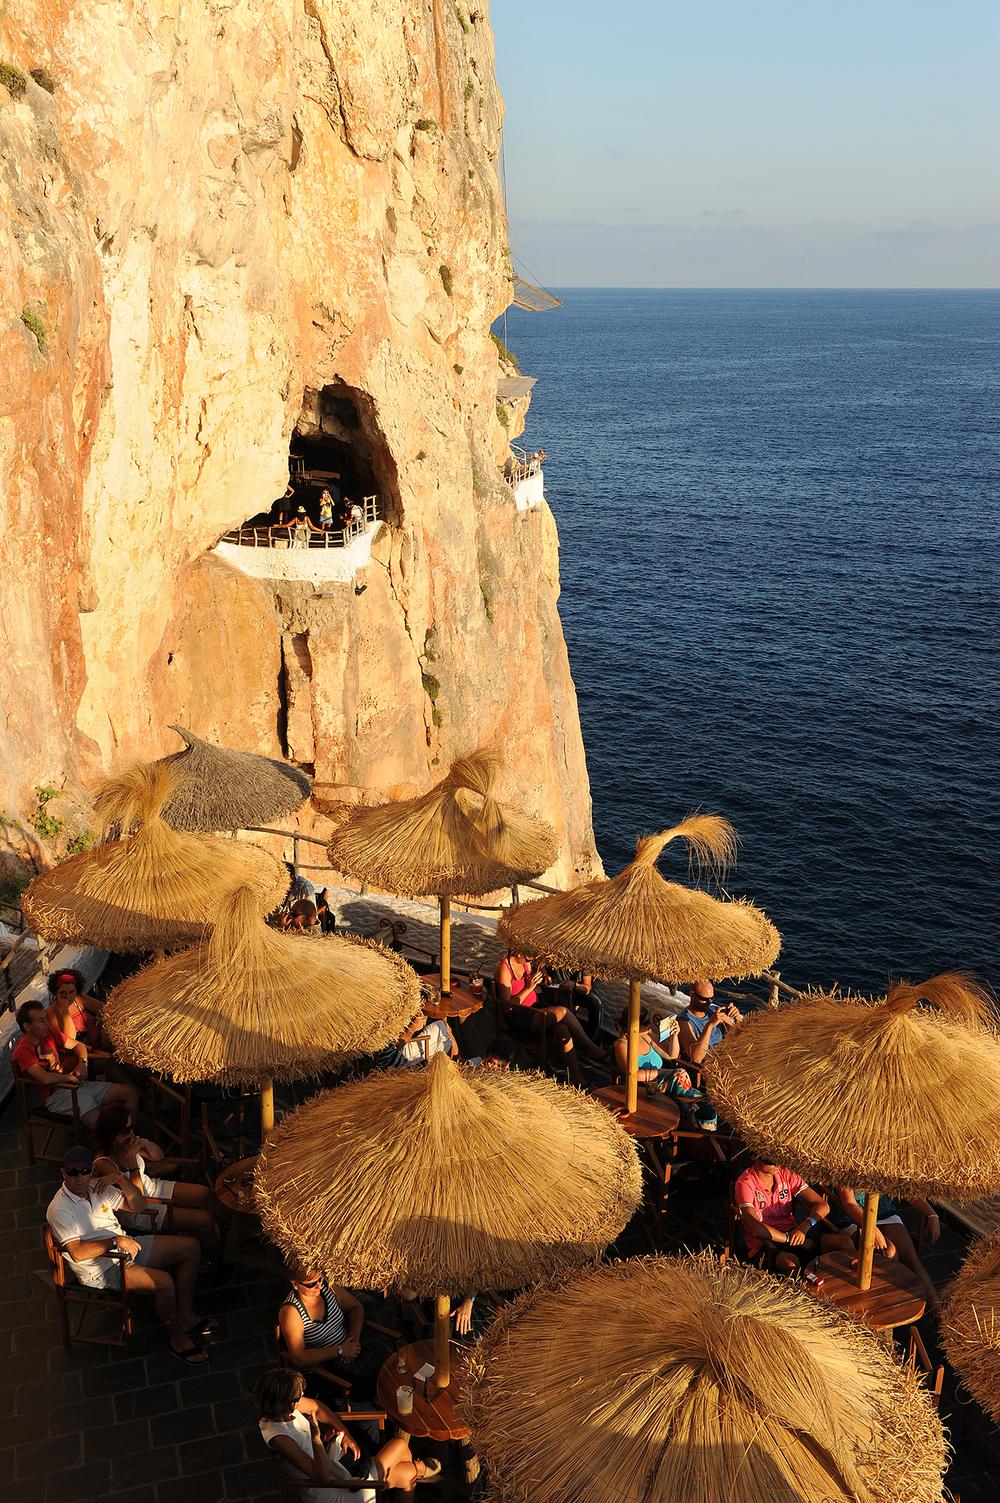 Matkablogi, Espanja, matka, Menorca, auringonlasku, terassi, meri